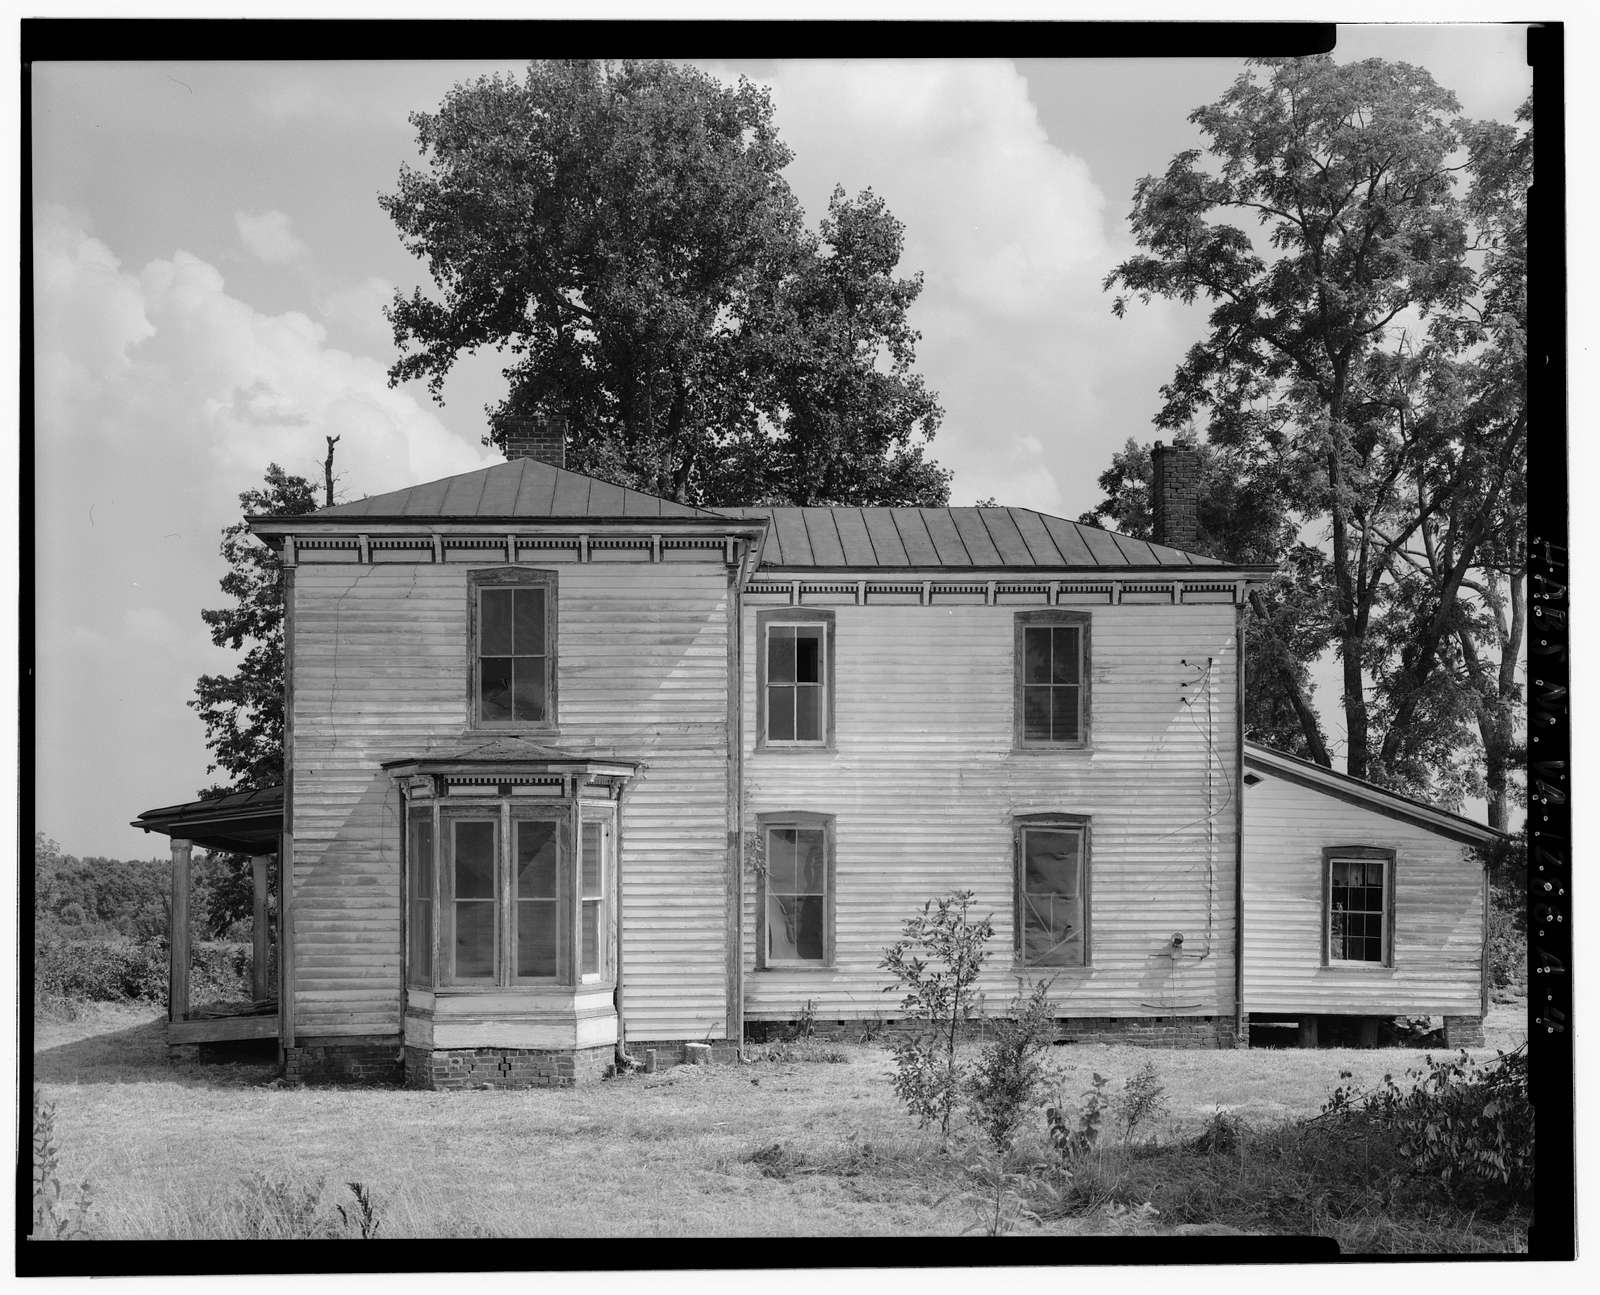 Fort Hill Farm, Mansion, West of Staunton (Roanoke) River between Turkey & Caesar's Runs, Clover, Halifax County, VA